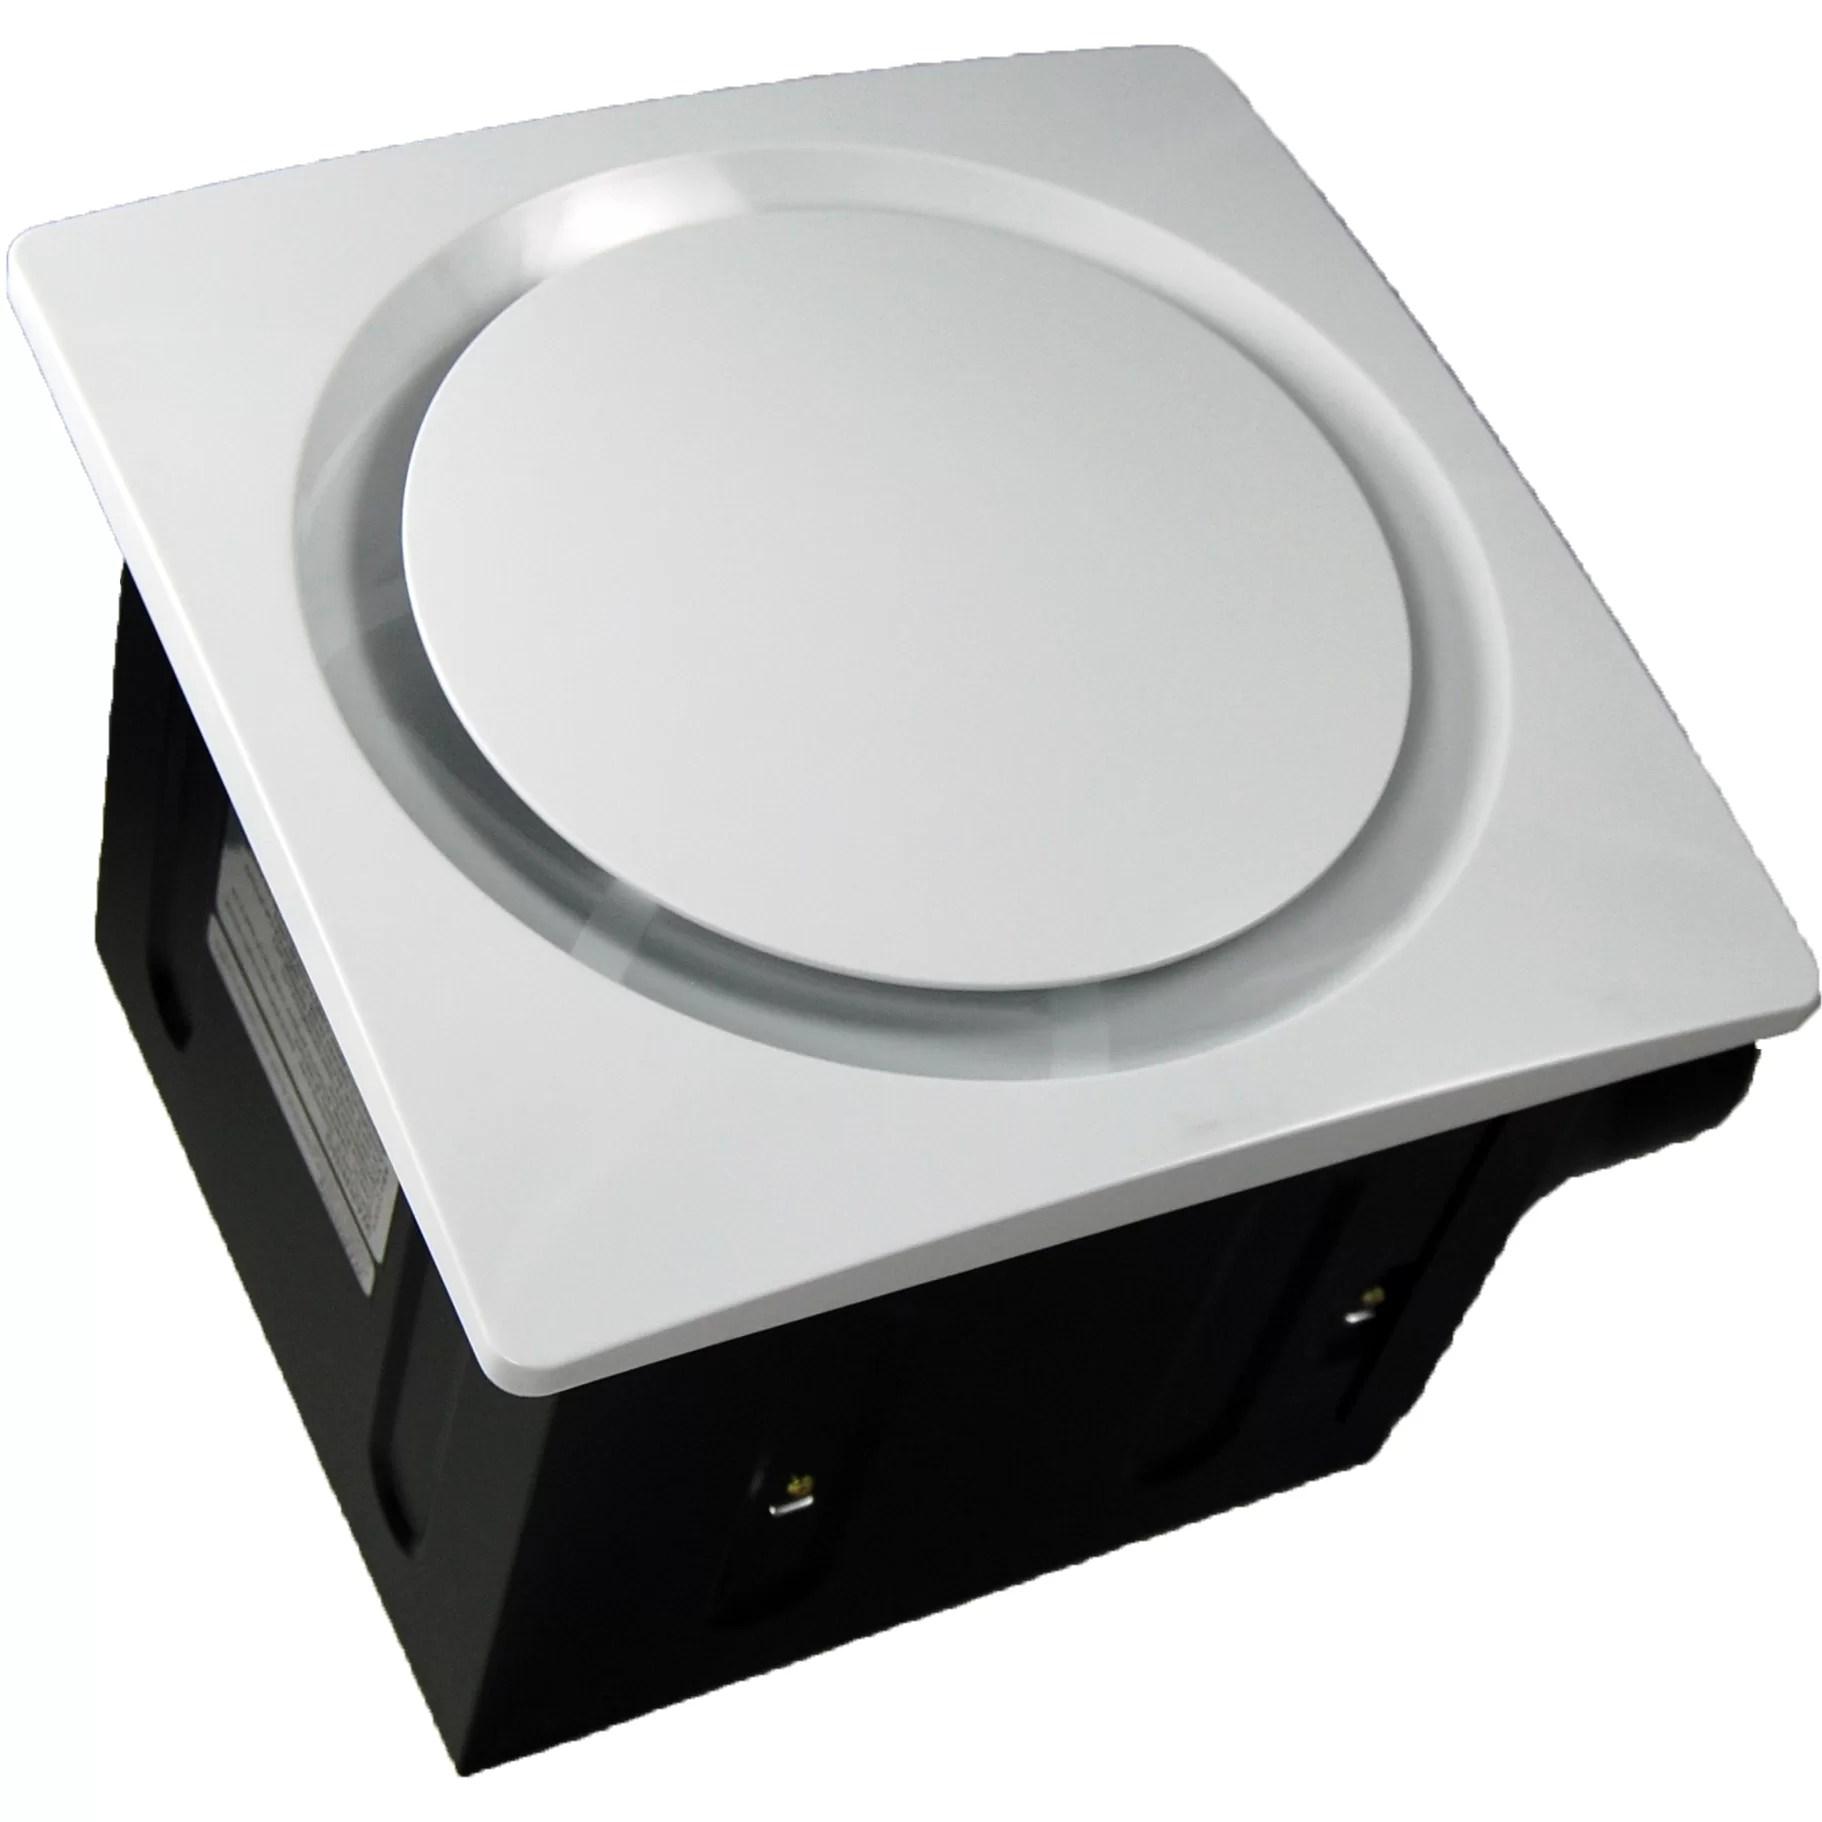 Aero Pure Super Quiet 110 CFM Bathroom Ventilation Fan  Reviews  Wayfair